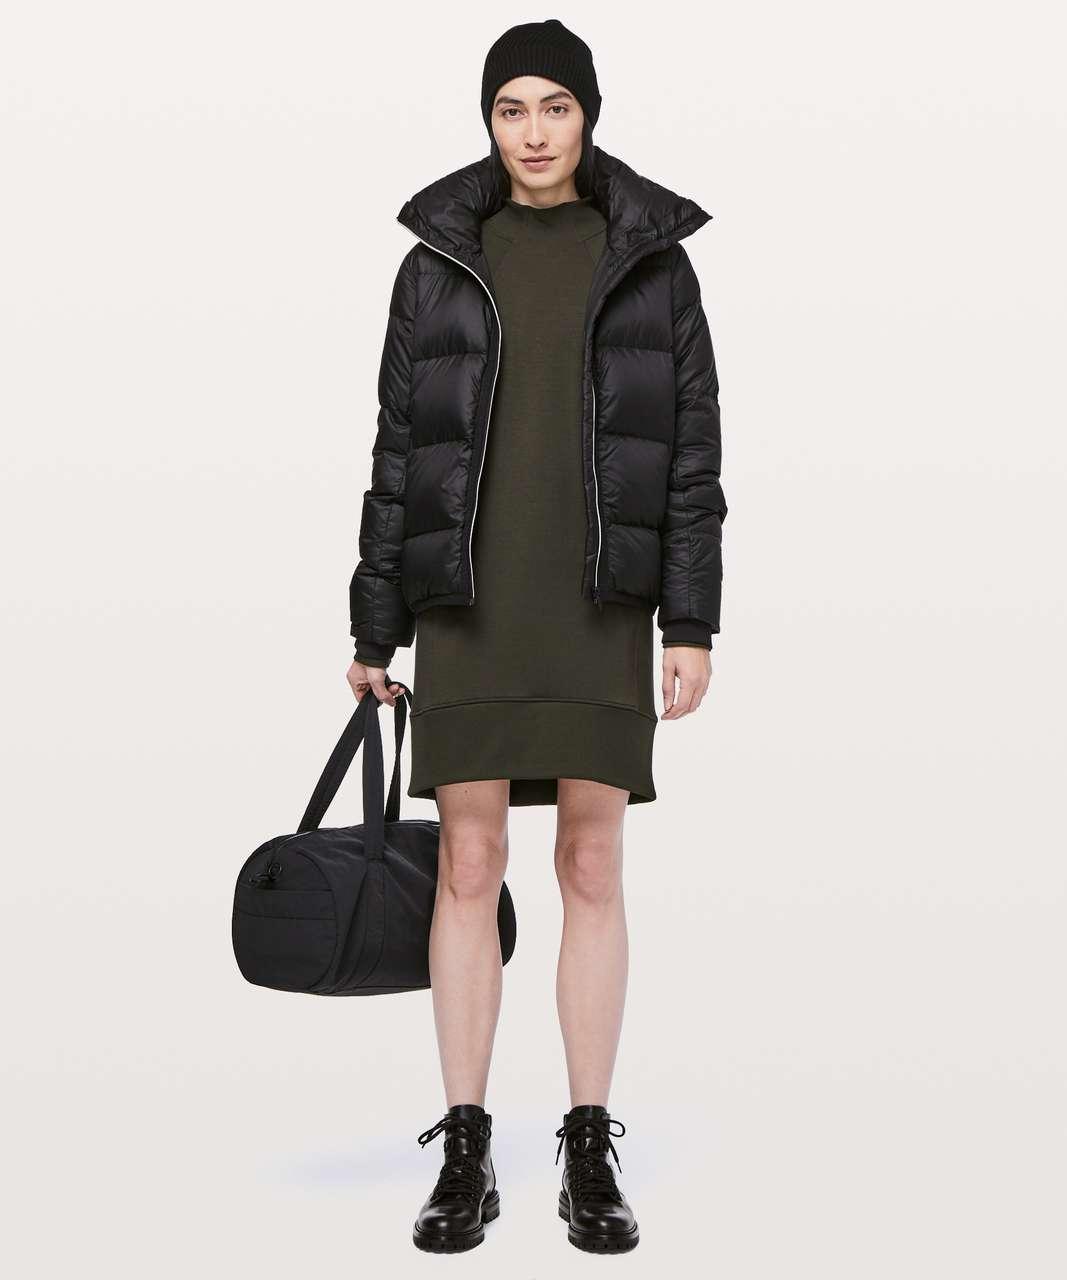 Lululemon Cozy Instincts Dress - Dark Olive